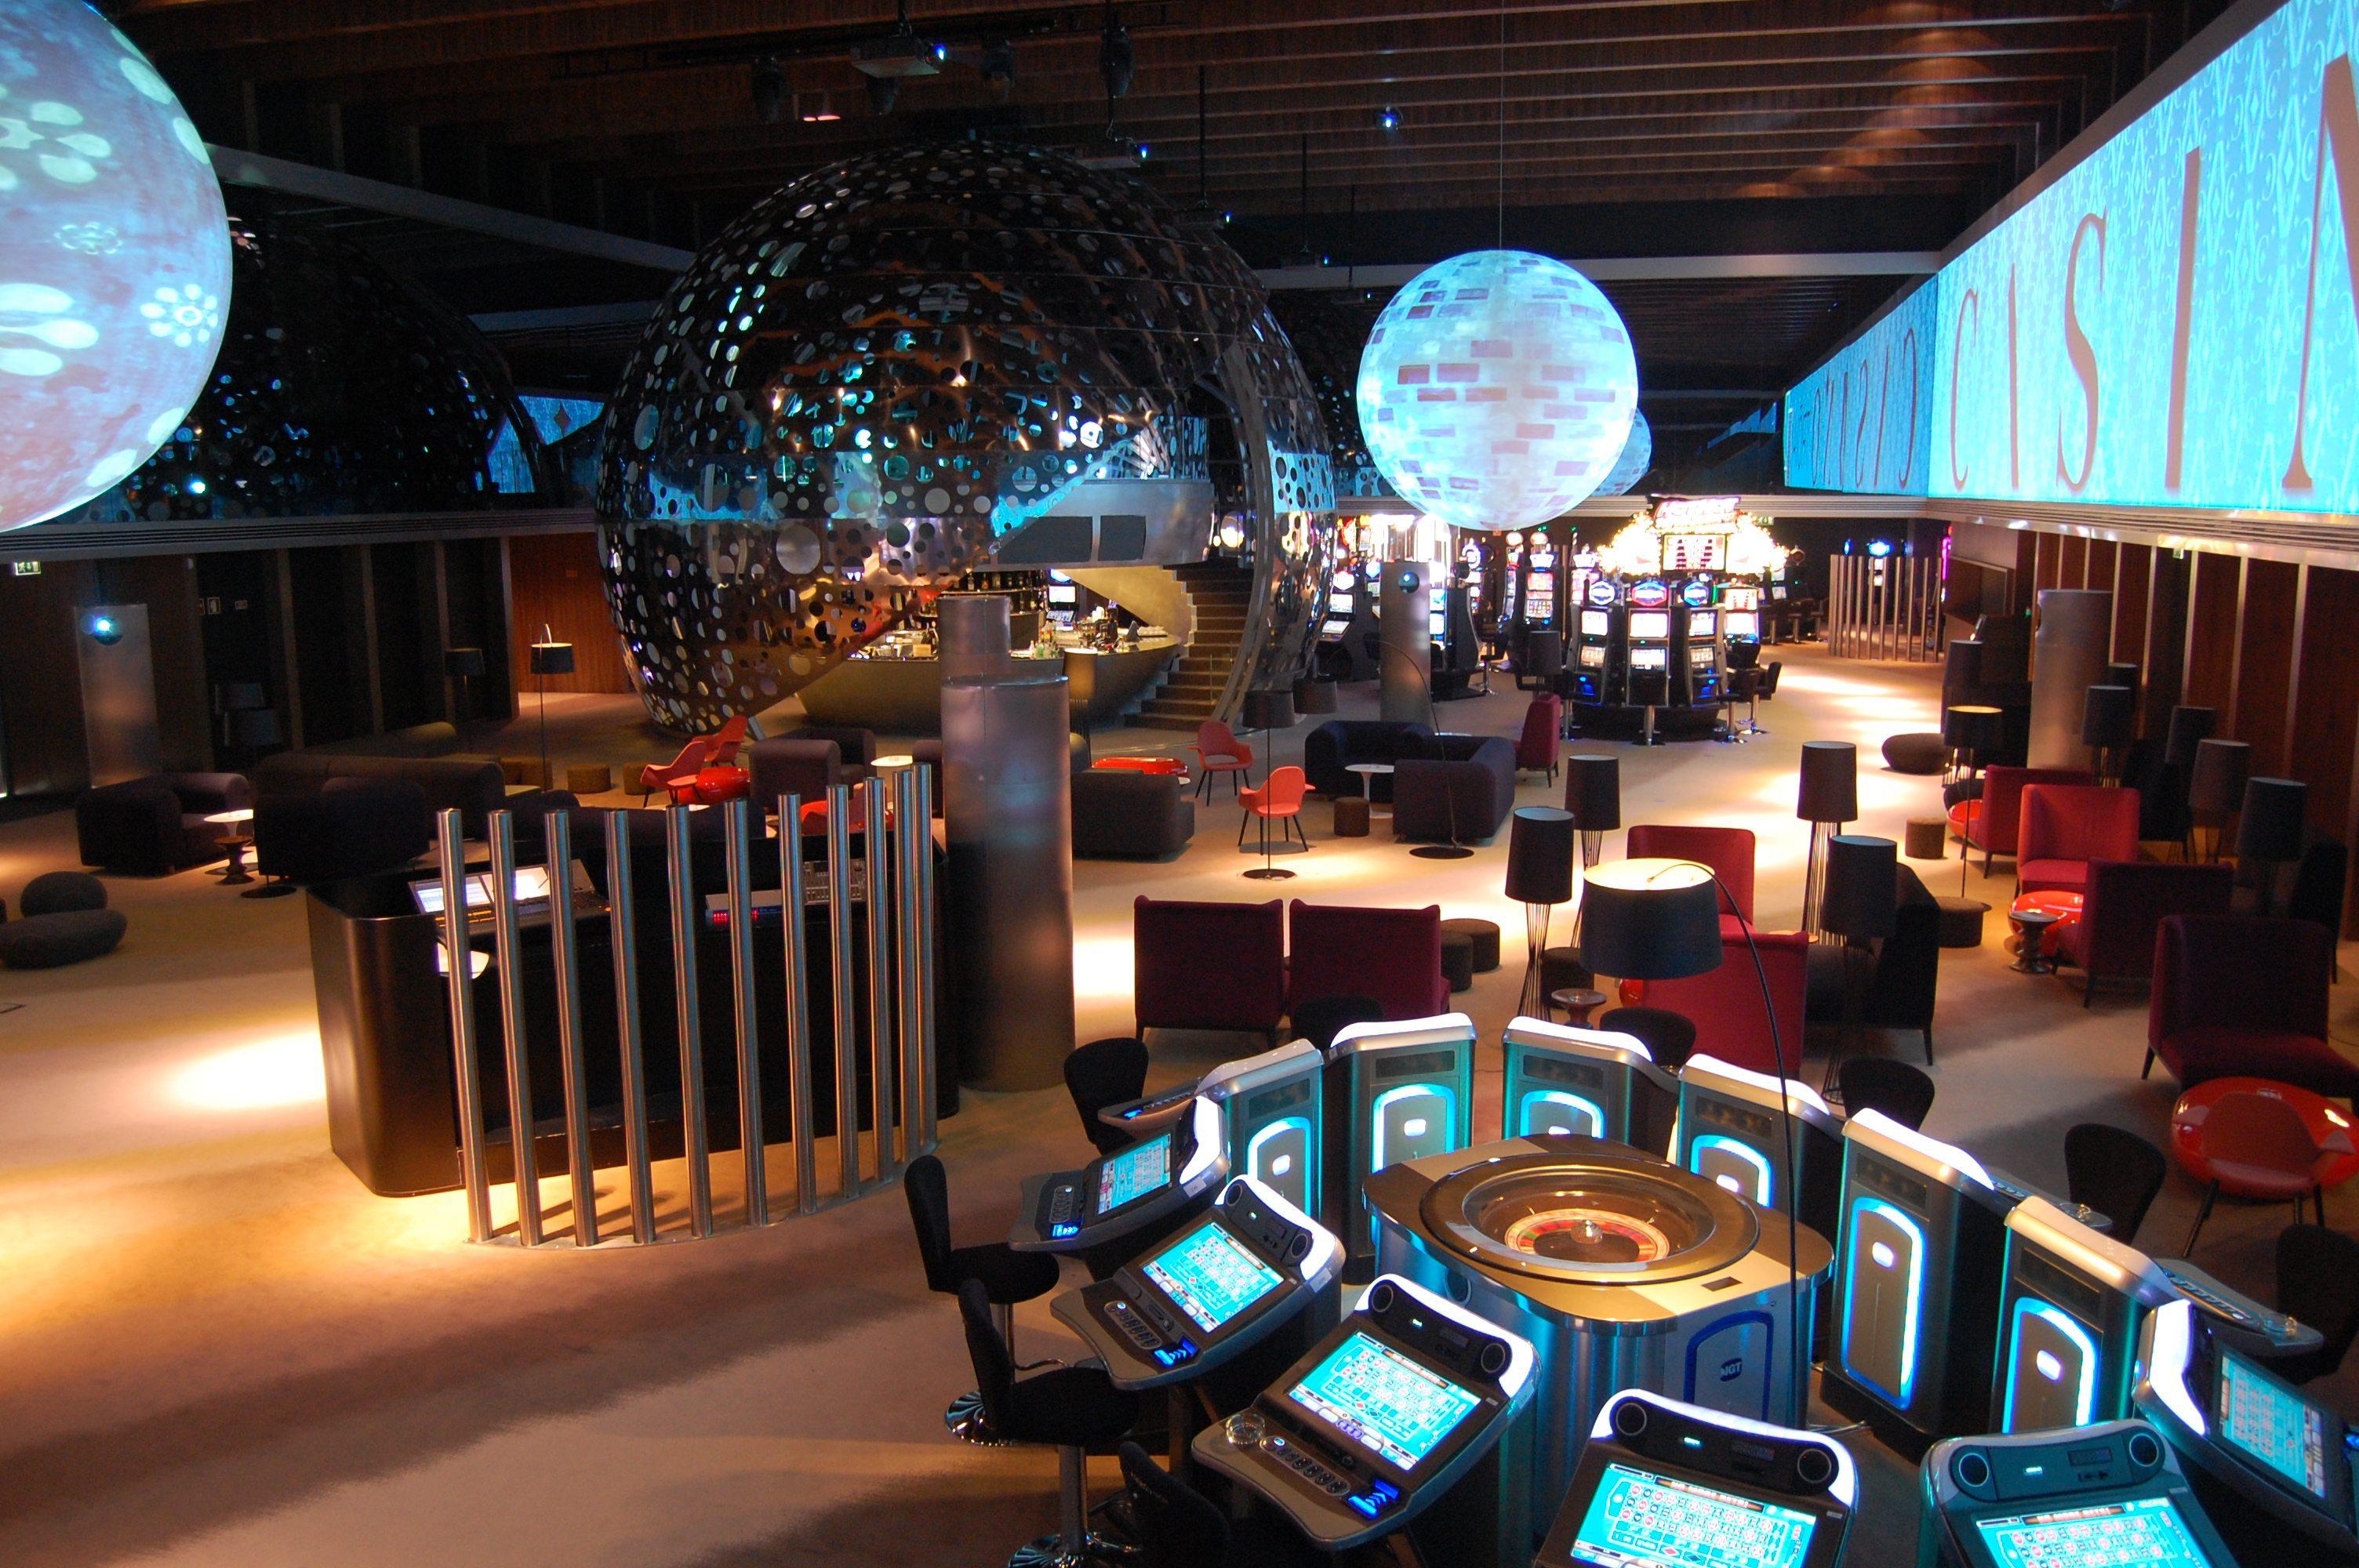 Casino de jeux a lisbonne shopping fallsview casino